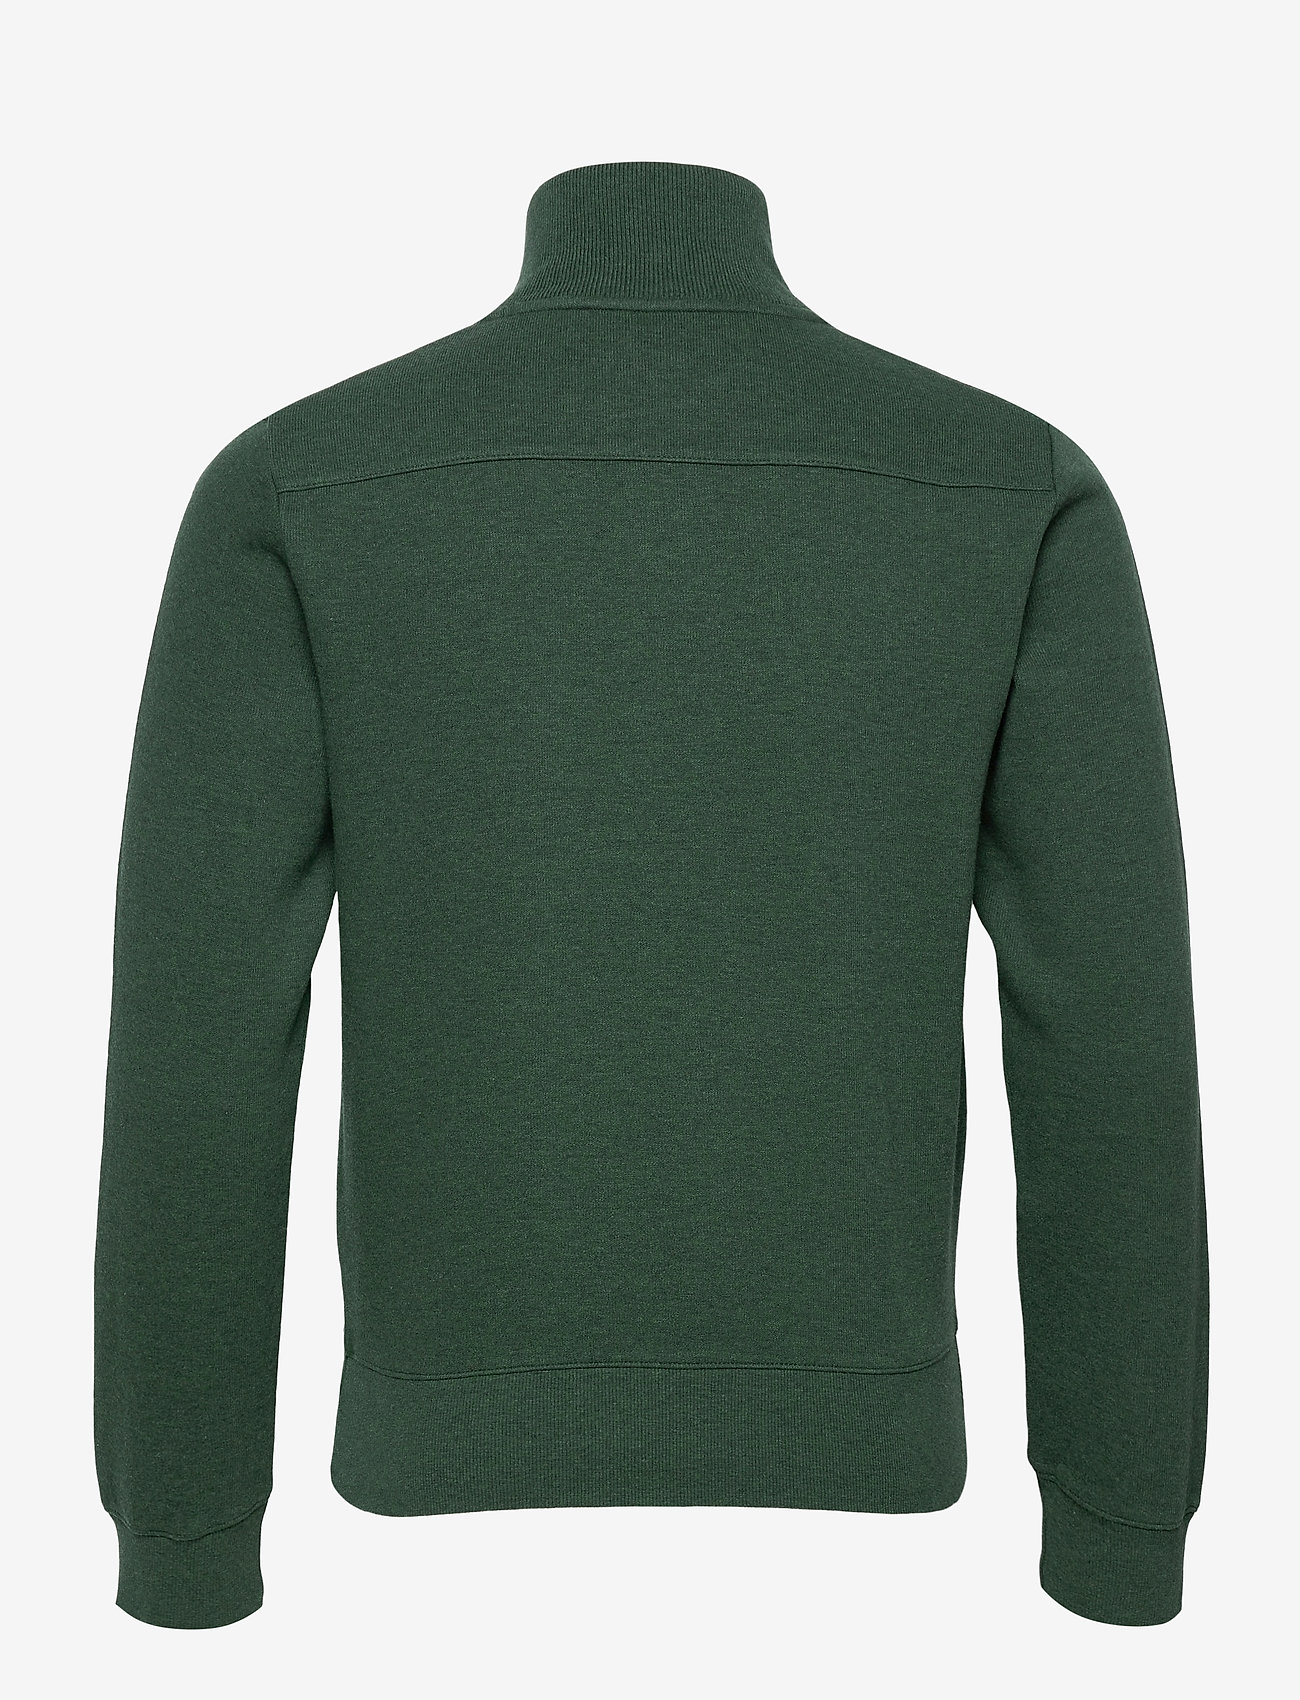 GANT - D2. SACKER RIB HALF ZIP - half zip jumpers - tartan green mel - 1